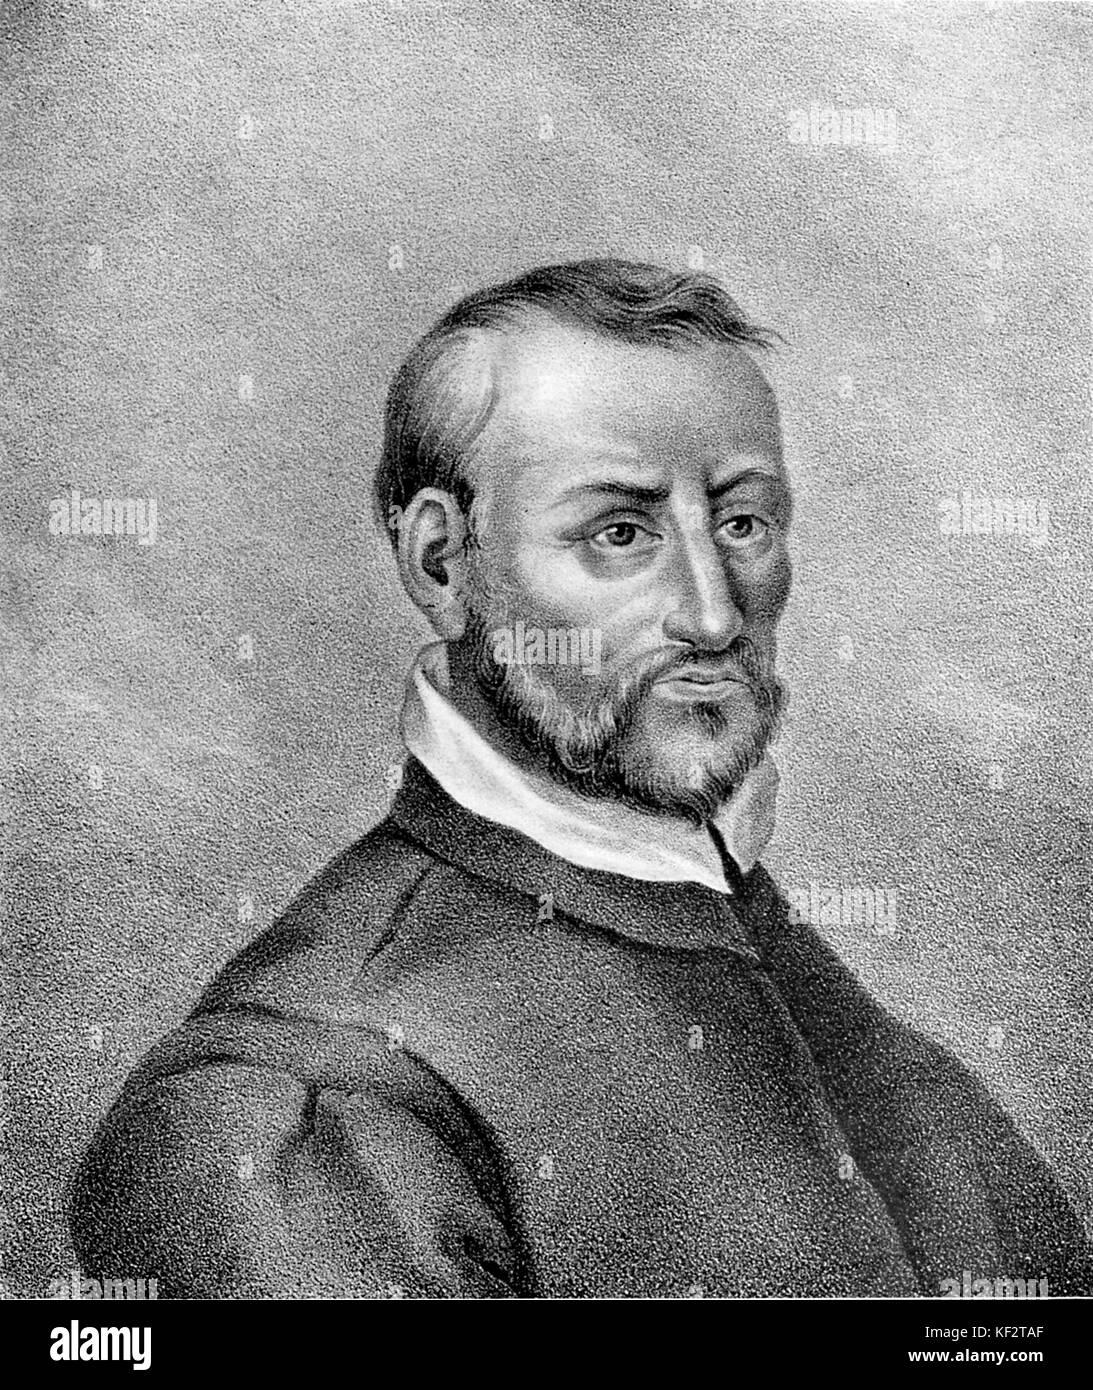 Giovanni Palestrina -  portrait. Italian composer, c.1525 - 2 February 1594. Stock Photo